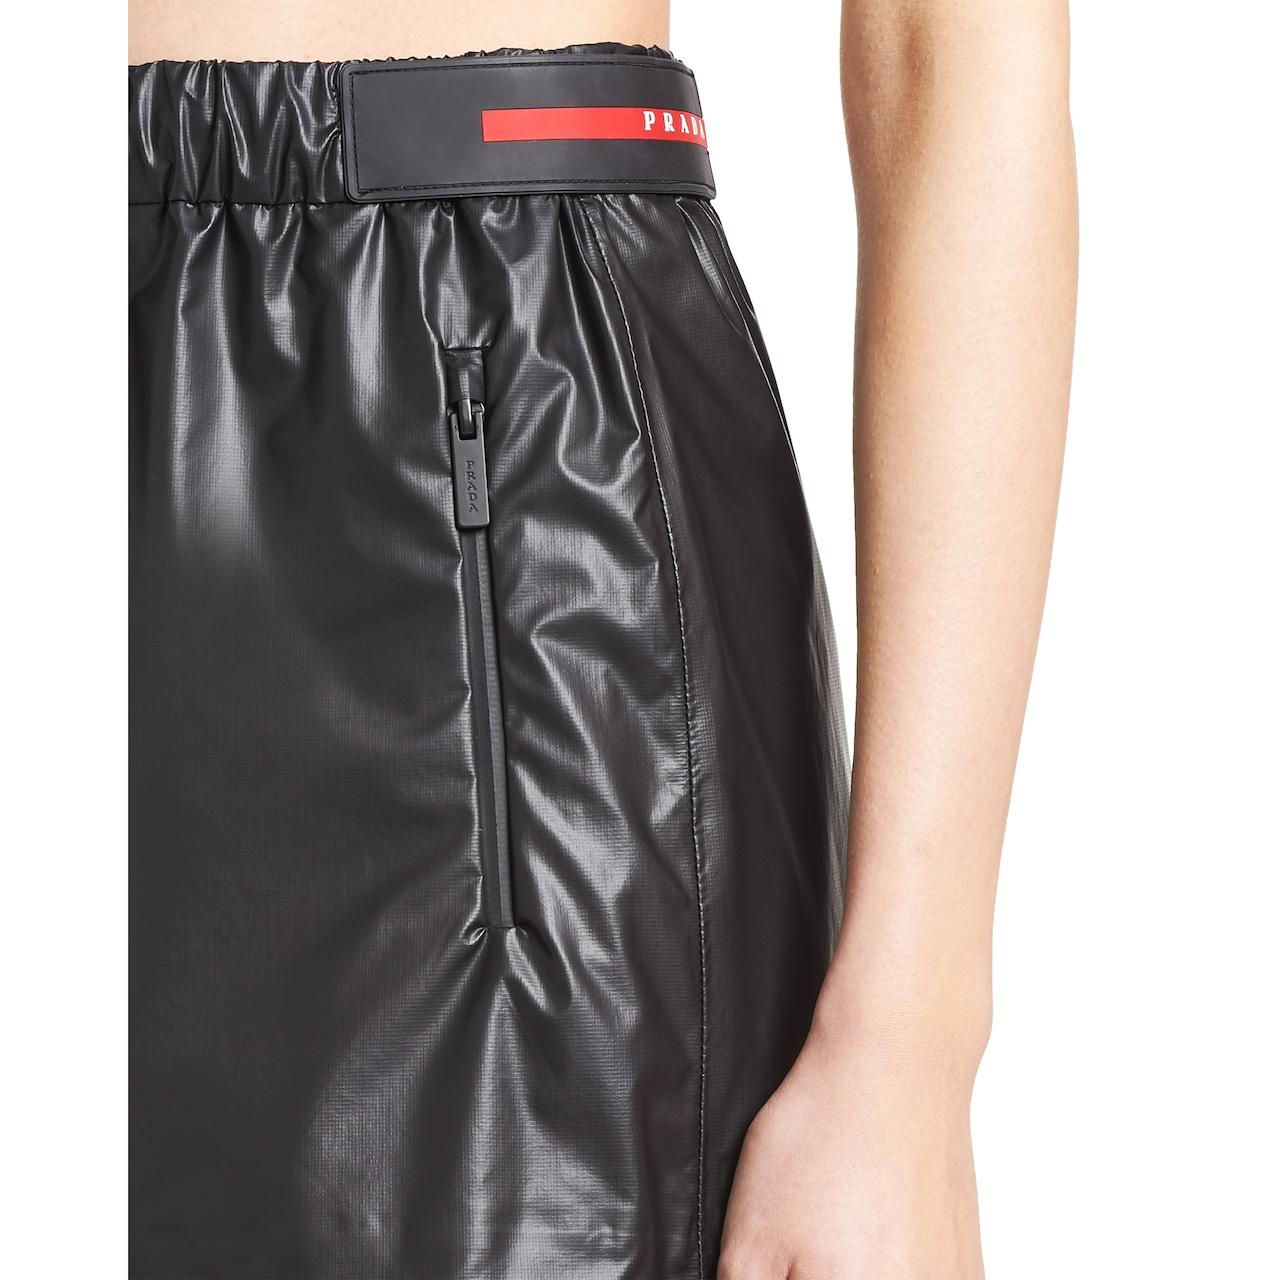 Prada LR-LX16-MK2 Light bonded nylon  shorts 5